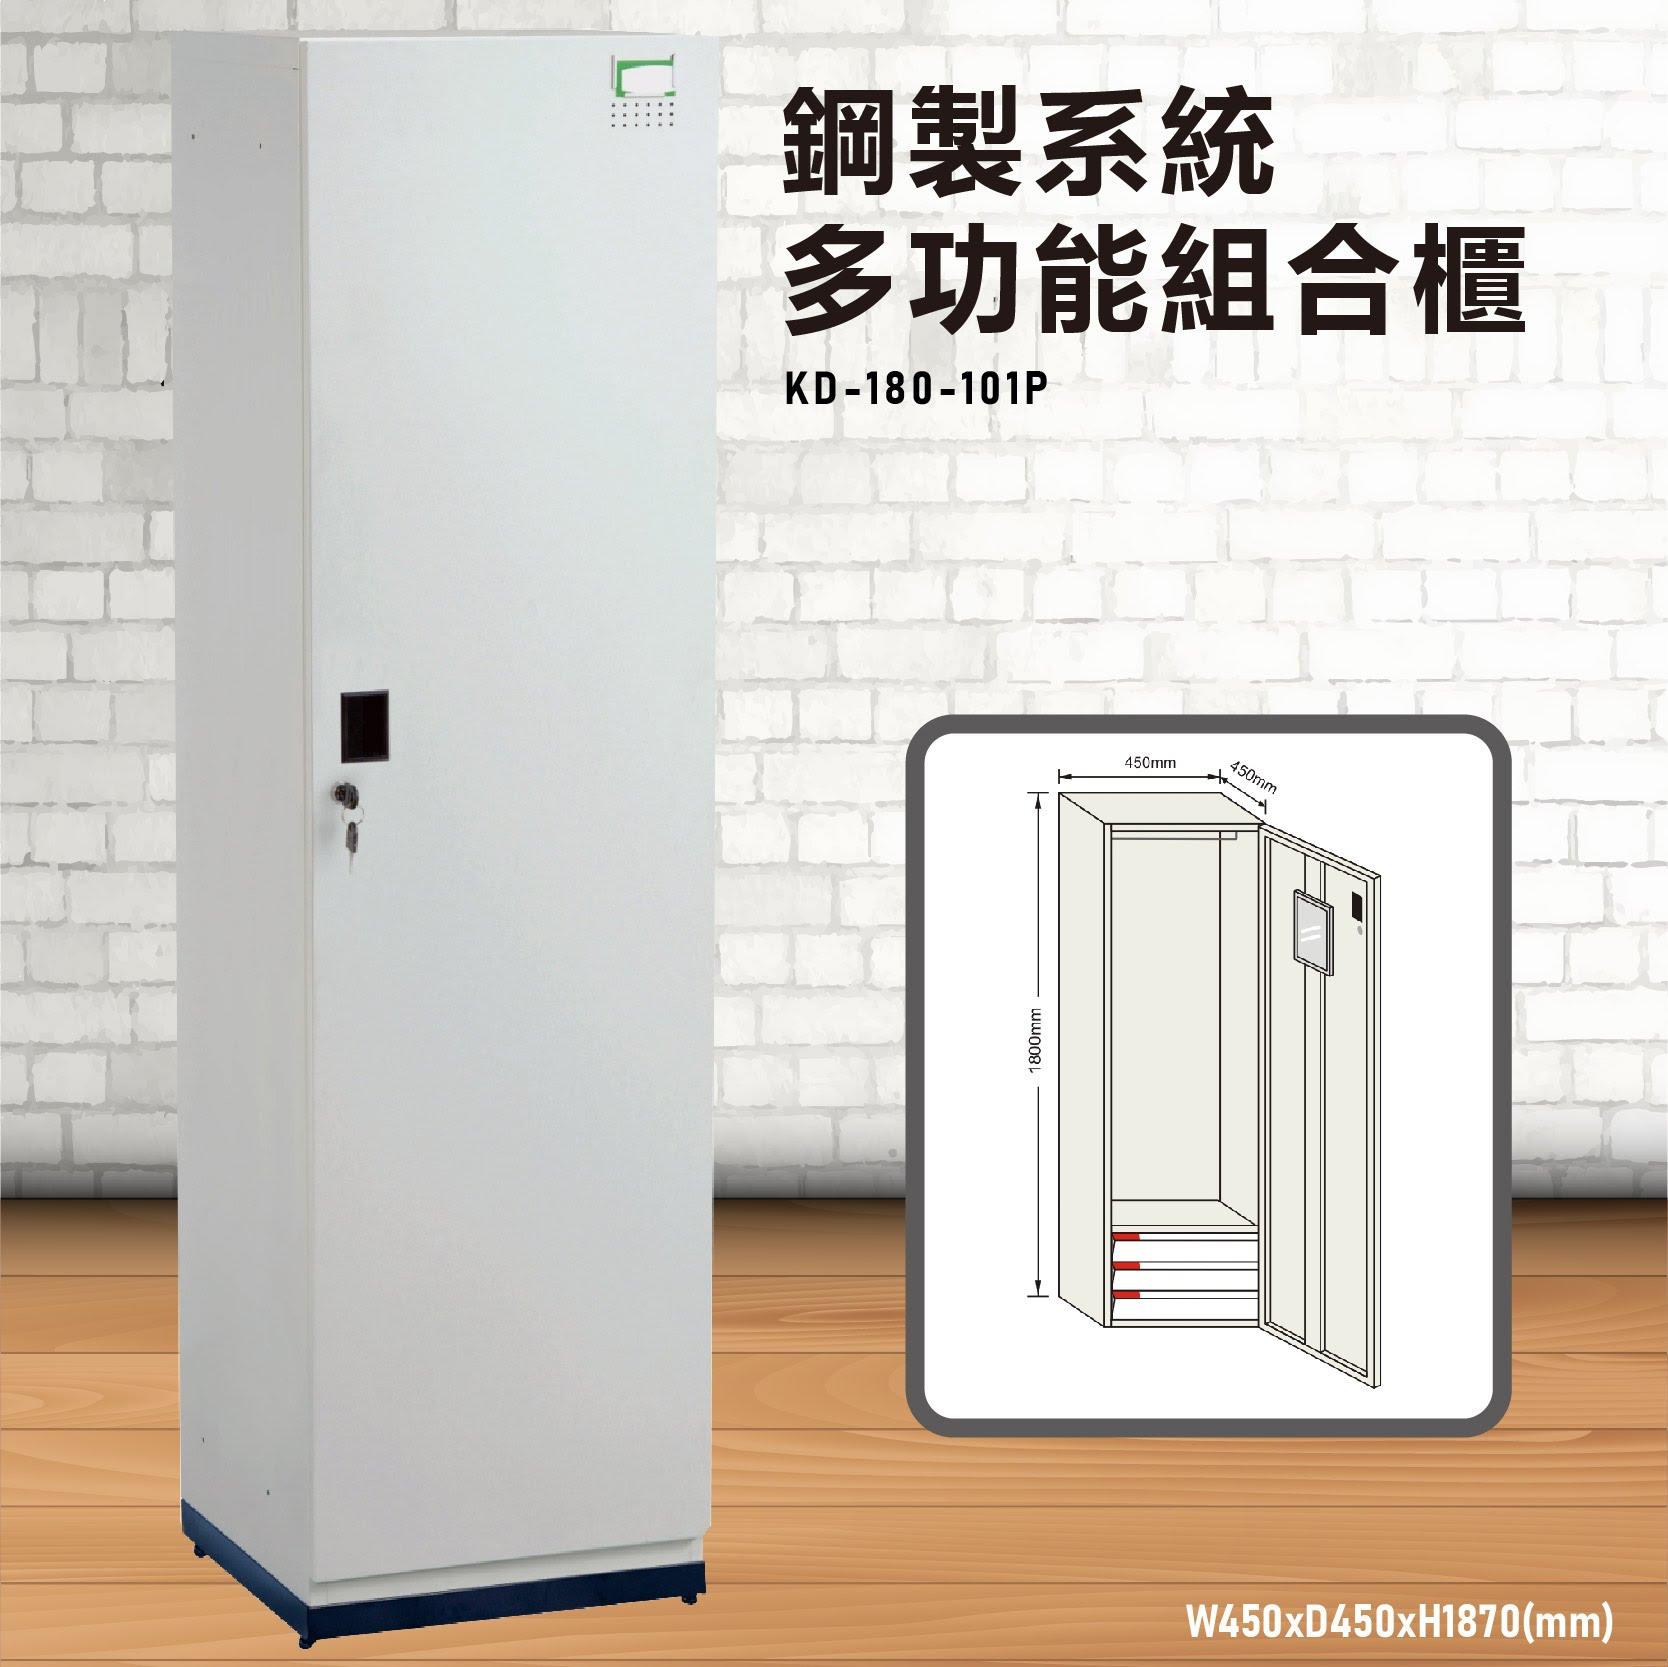 【MIT台灣製】KD鋼製系統多功能組合櫃 KD-180-101PA 收納櫃 置物櫃 公文櫃 工具櫃